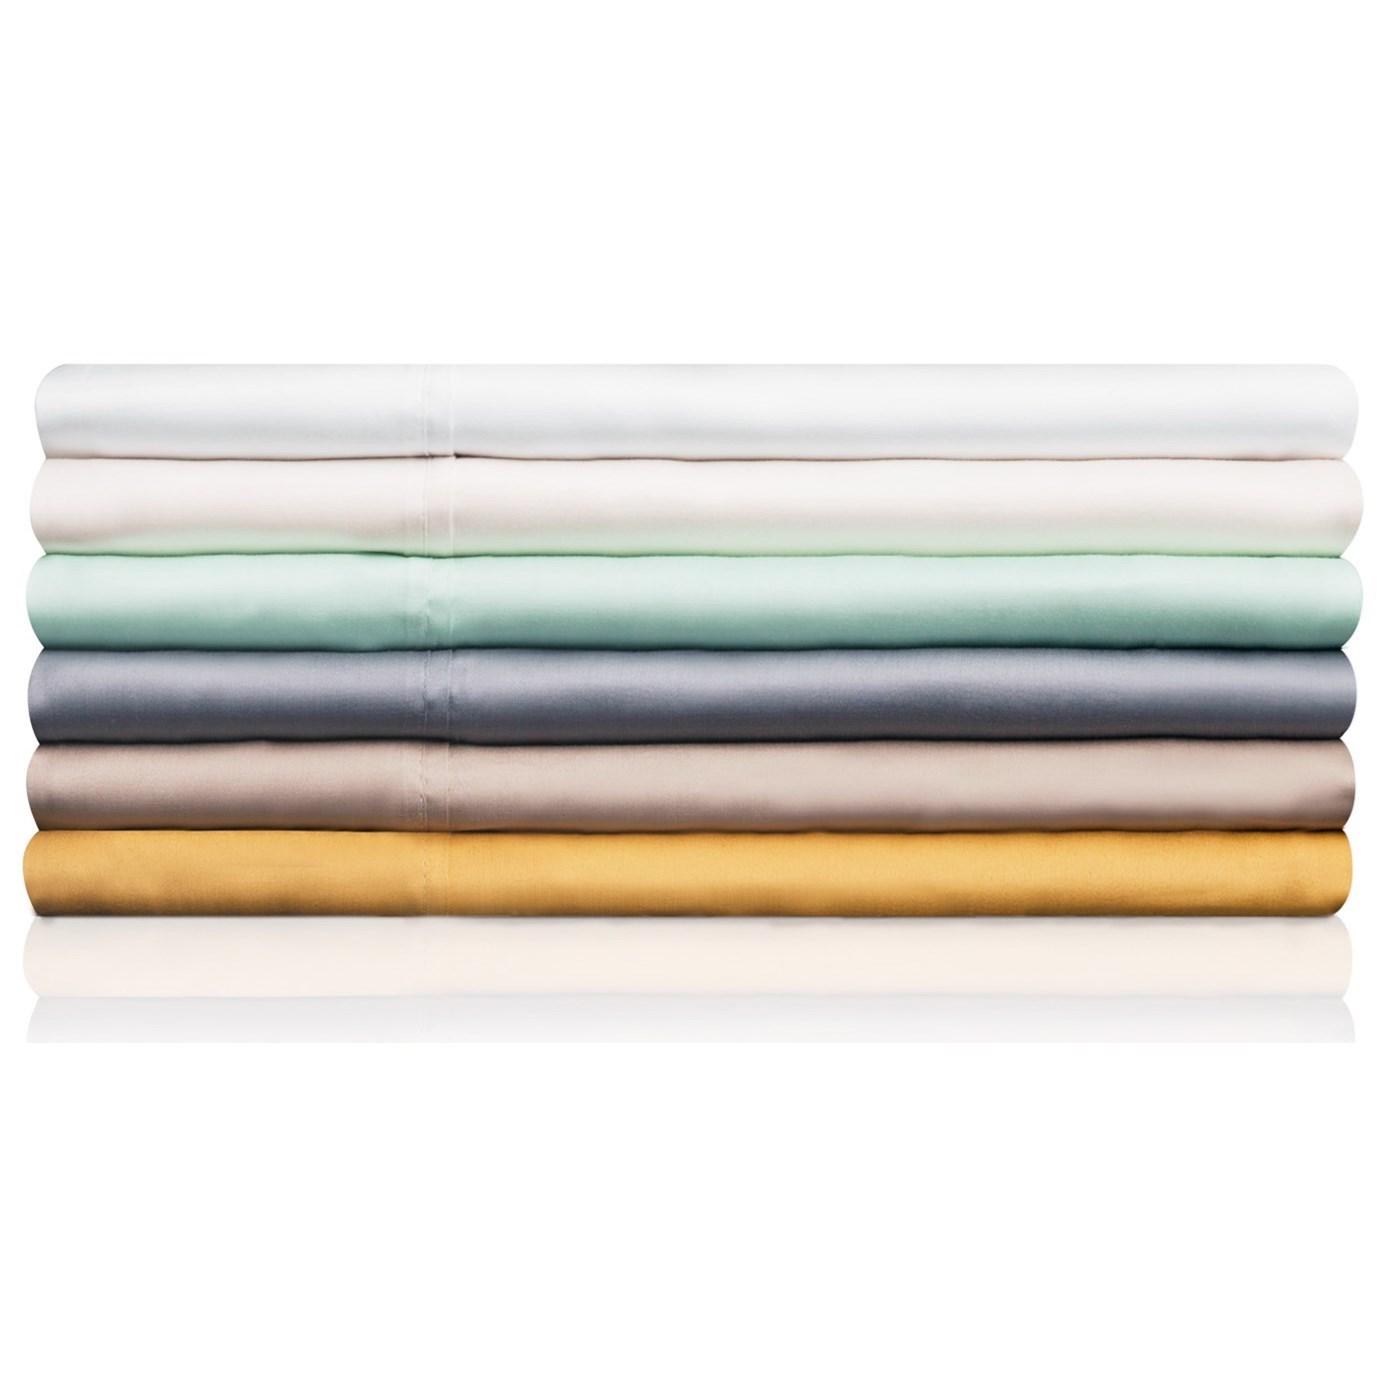 Malouf TENCEL® Full Woven™ TENCEL® Sheet Set - Item Number: MA03FFHATS